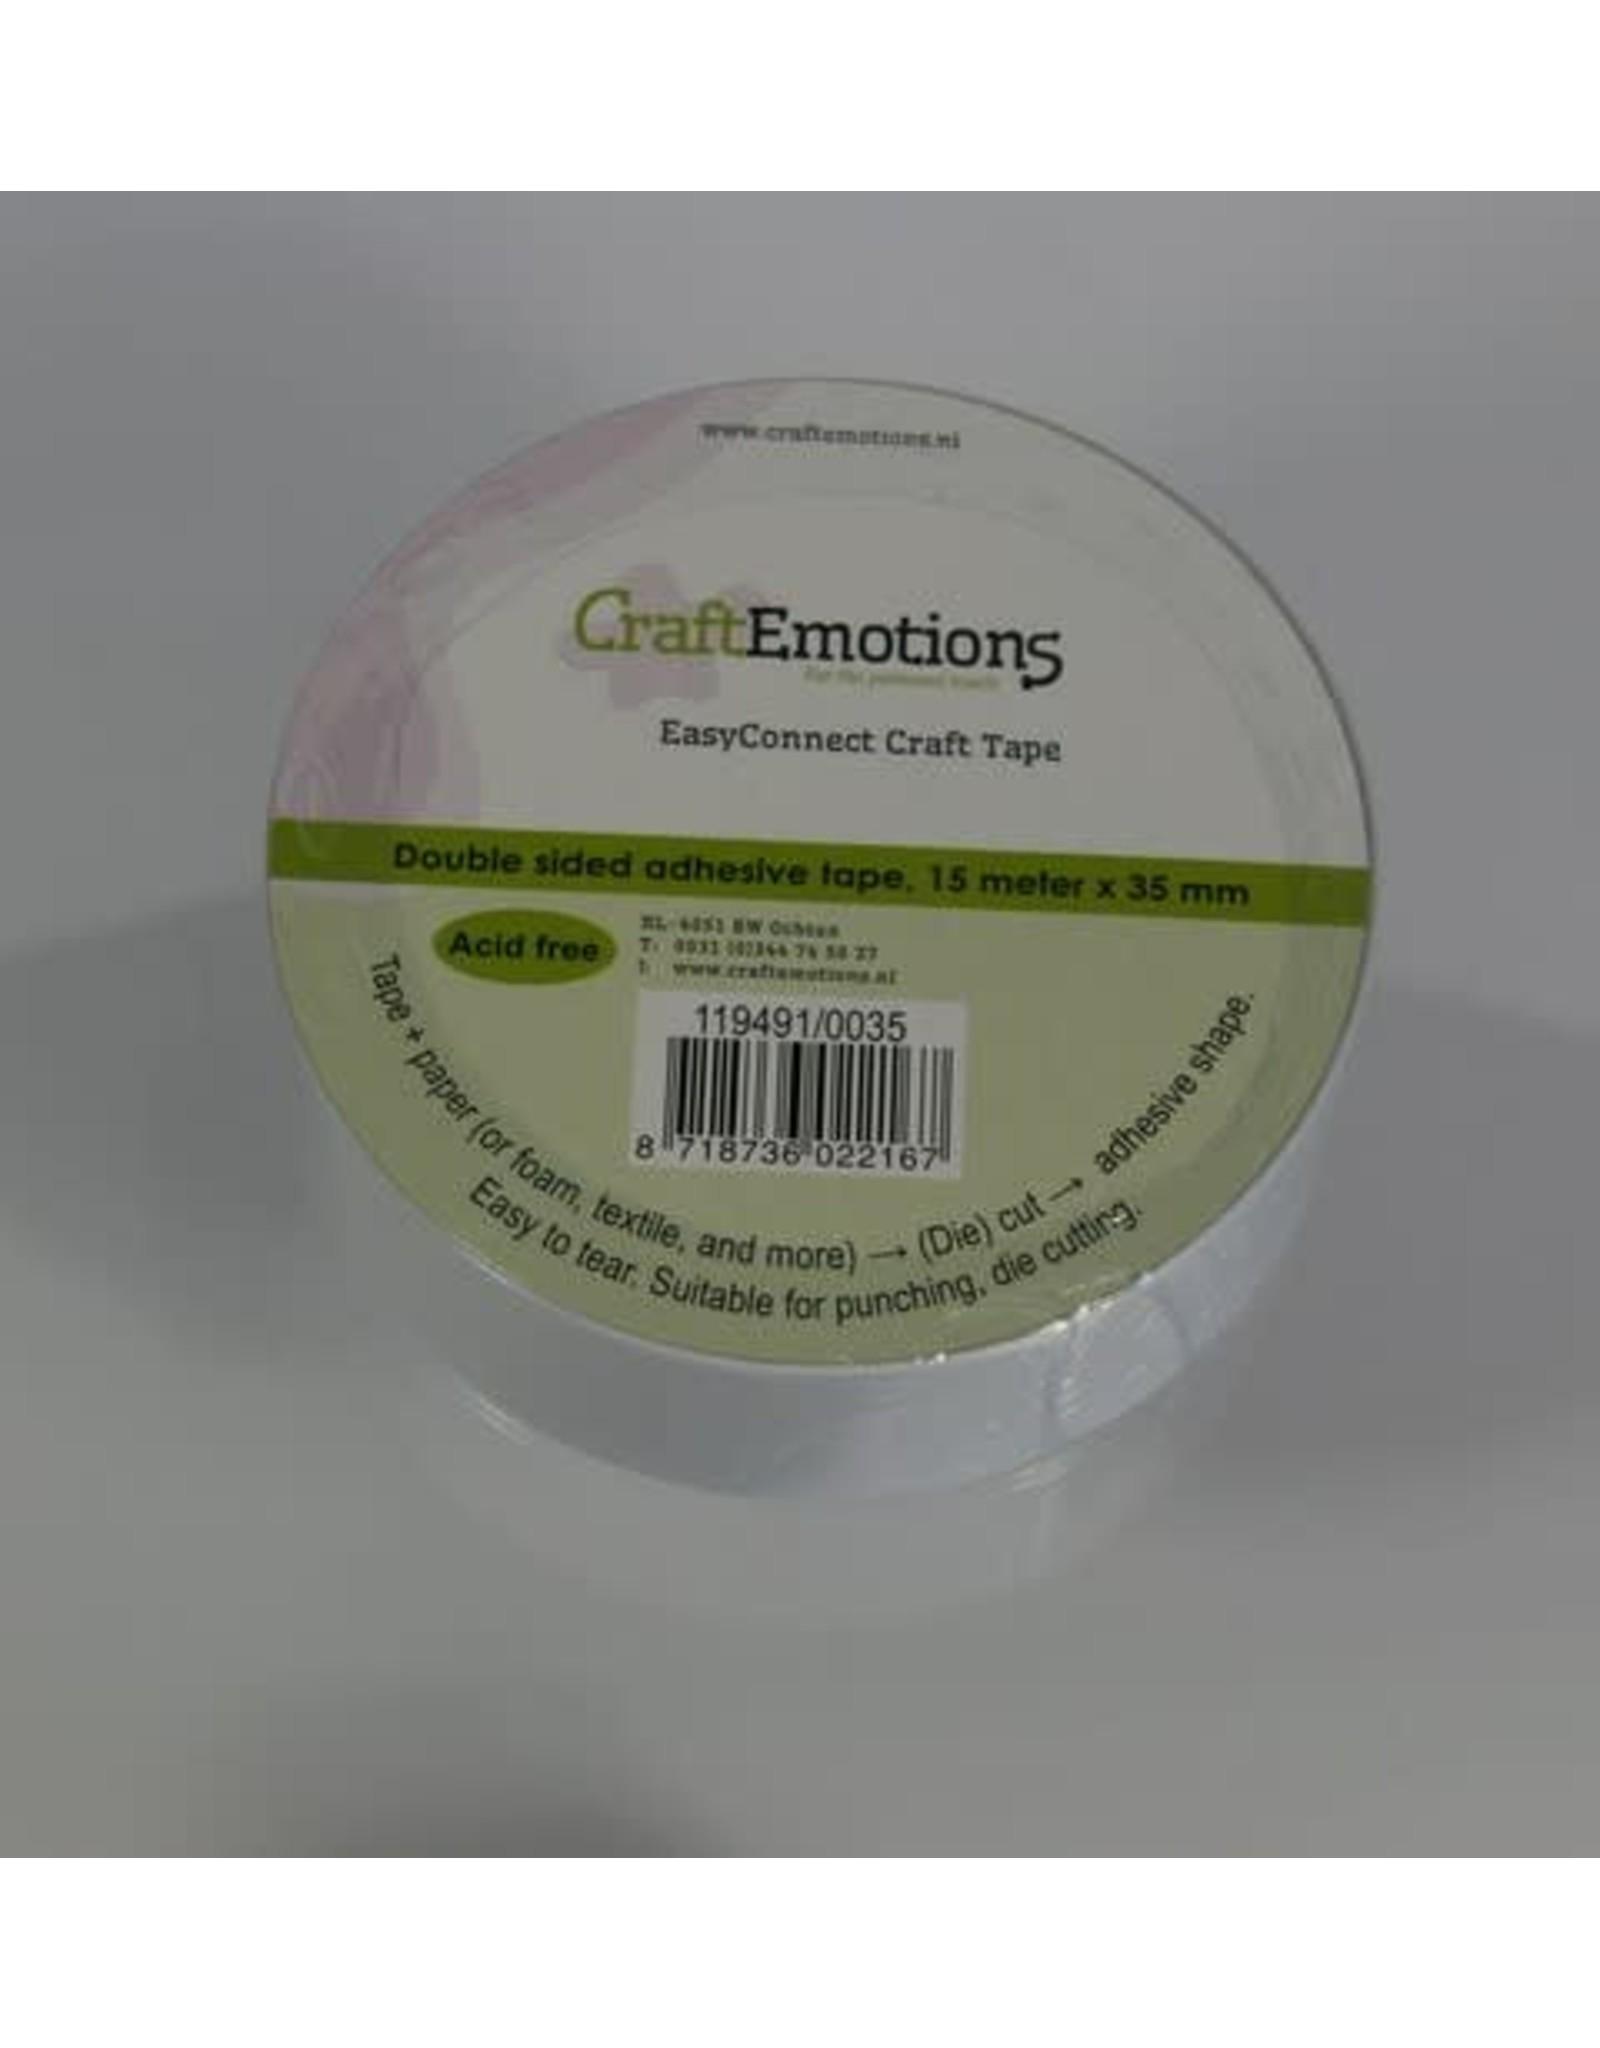 Craft Emotions CraftEmotions EasyConnect (dubbelzijdig klevend) Craft tape